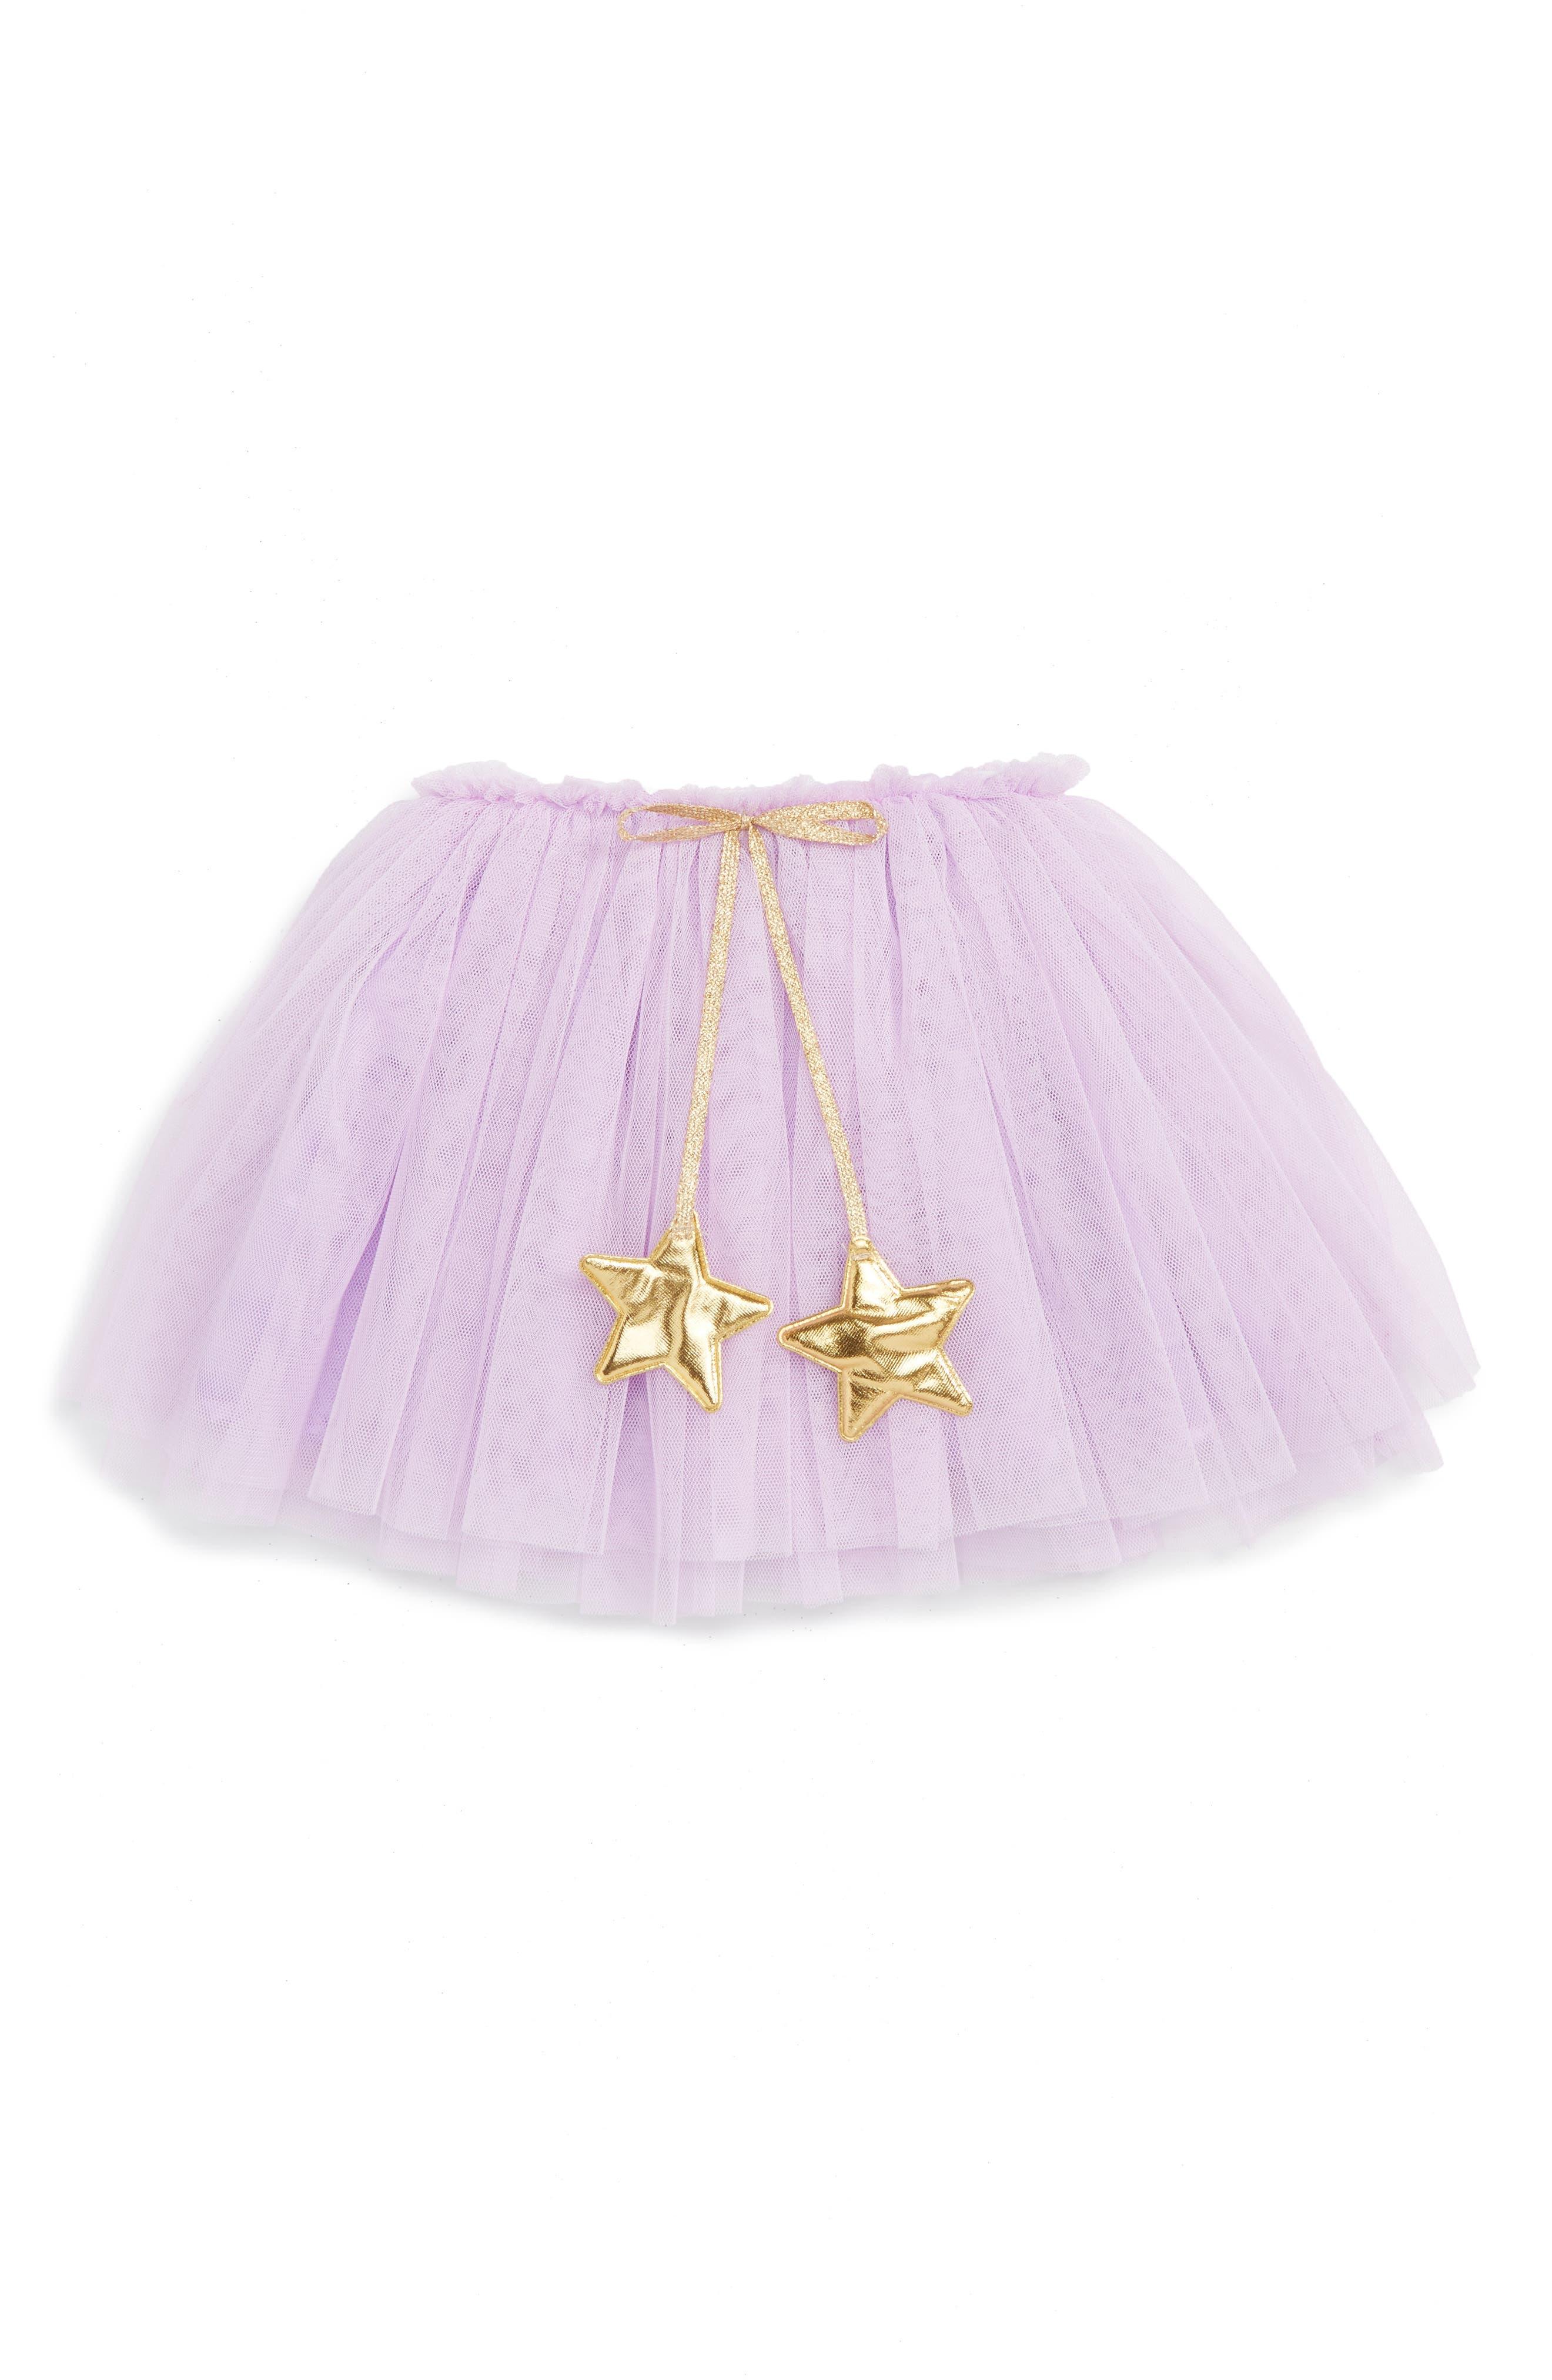 POPATU, Gold Star Tutu Skirt, Main thumbnail 1, color, PURPLE